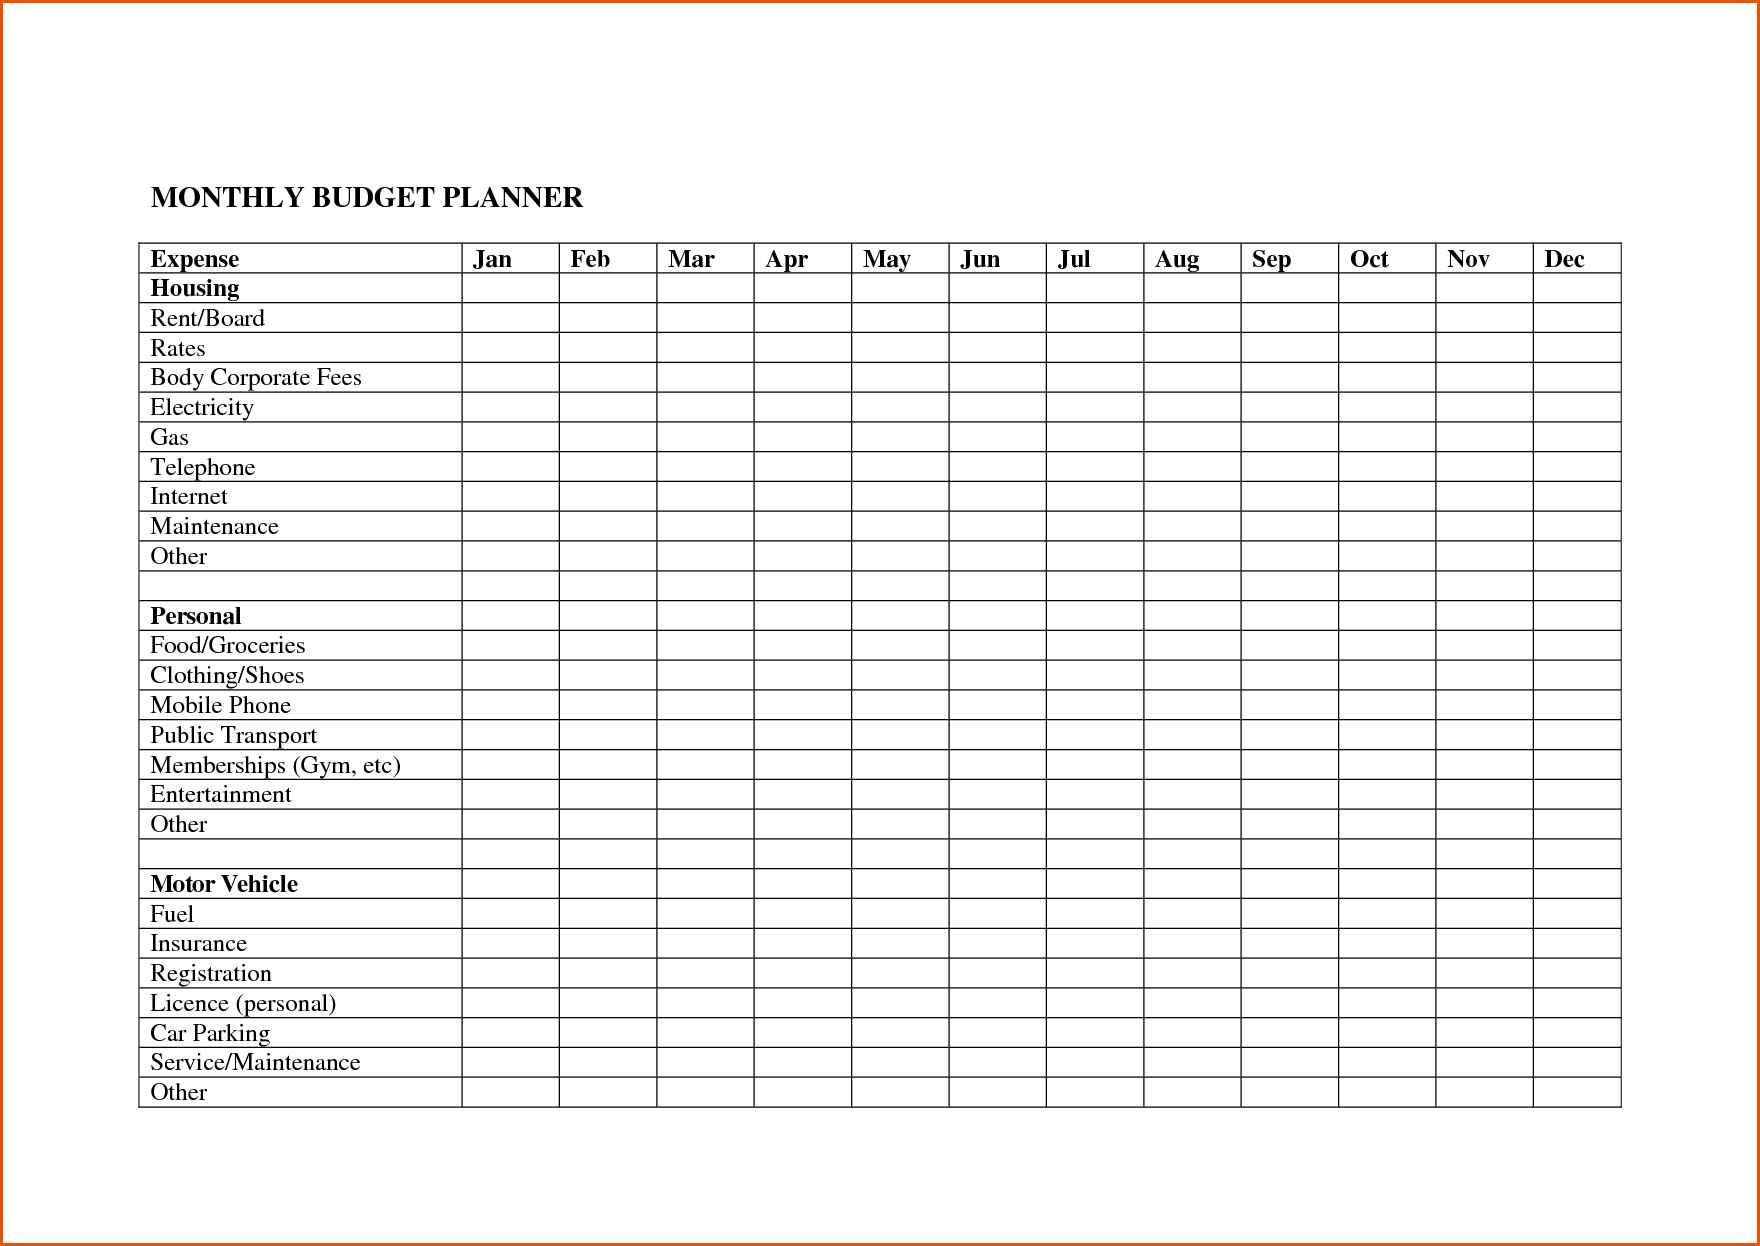 Bill Spreadsheet Template With Regard To Monthly Budget Excel Spreadsheet Template Free With Bill Plus Bills